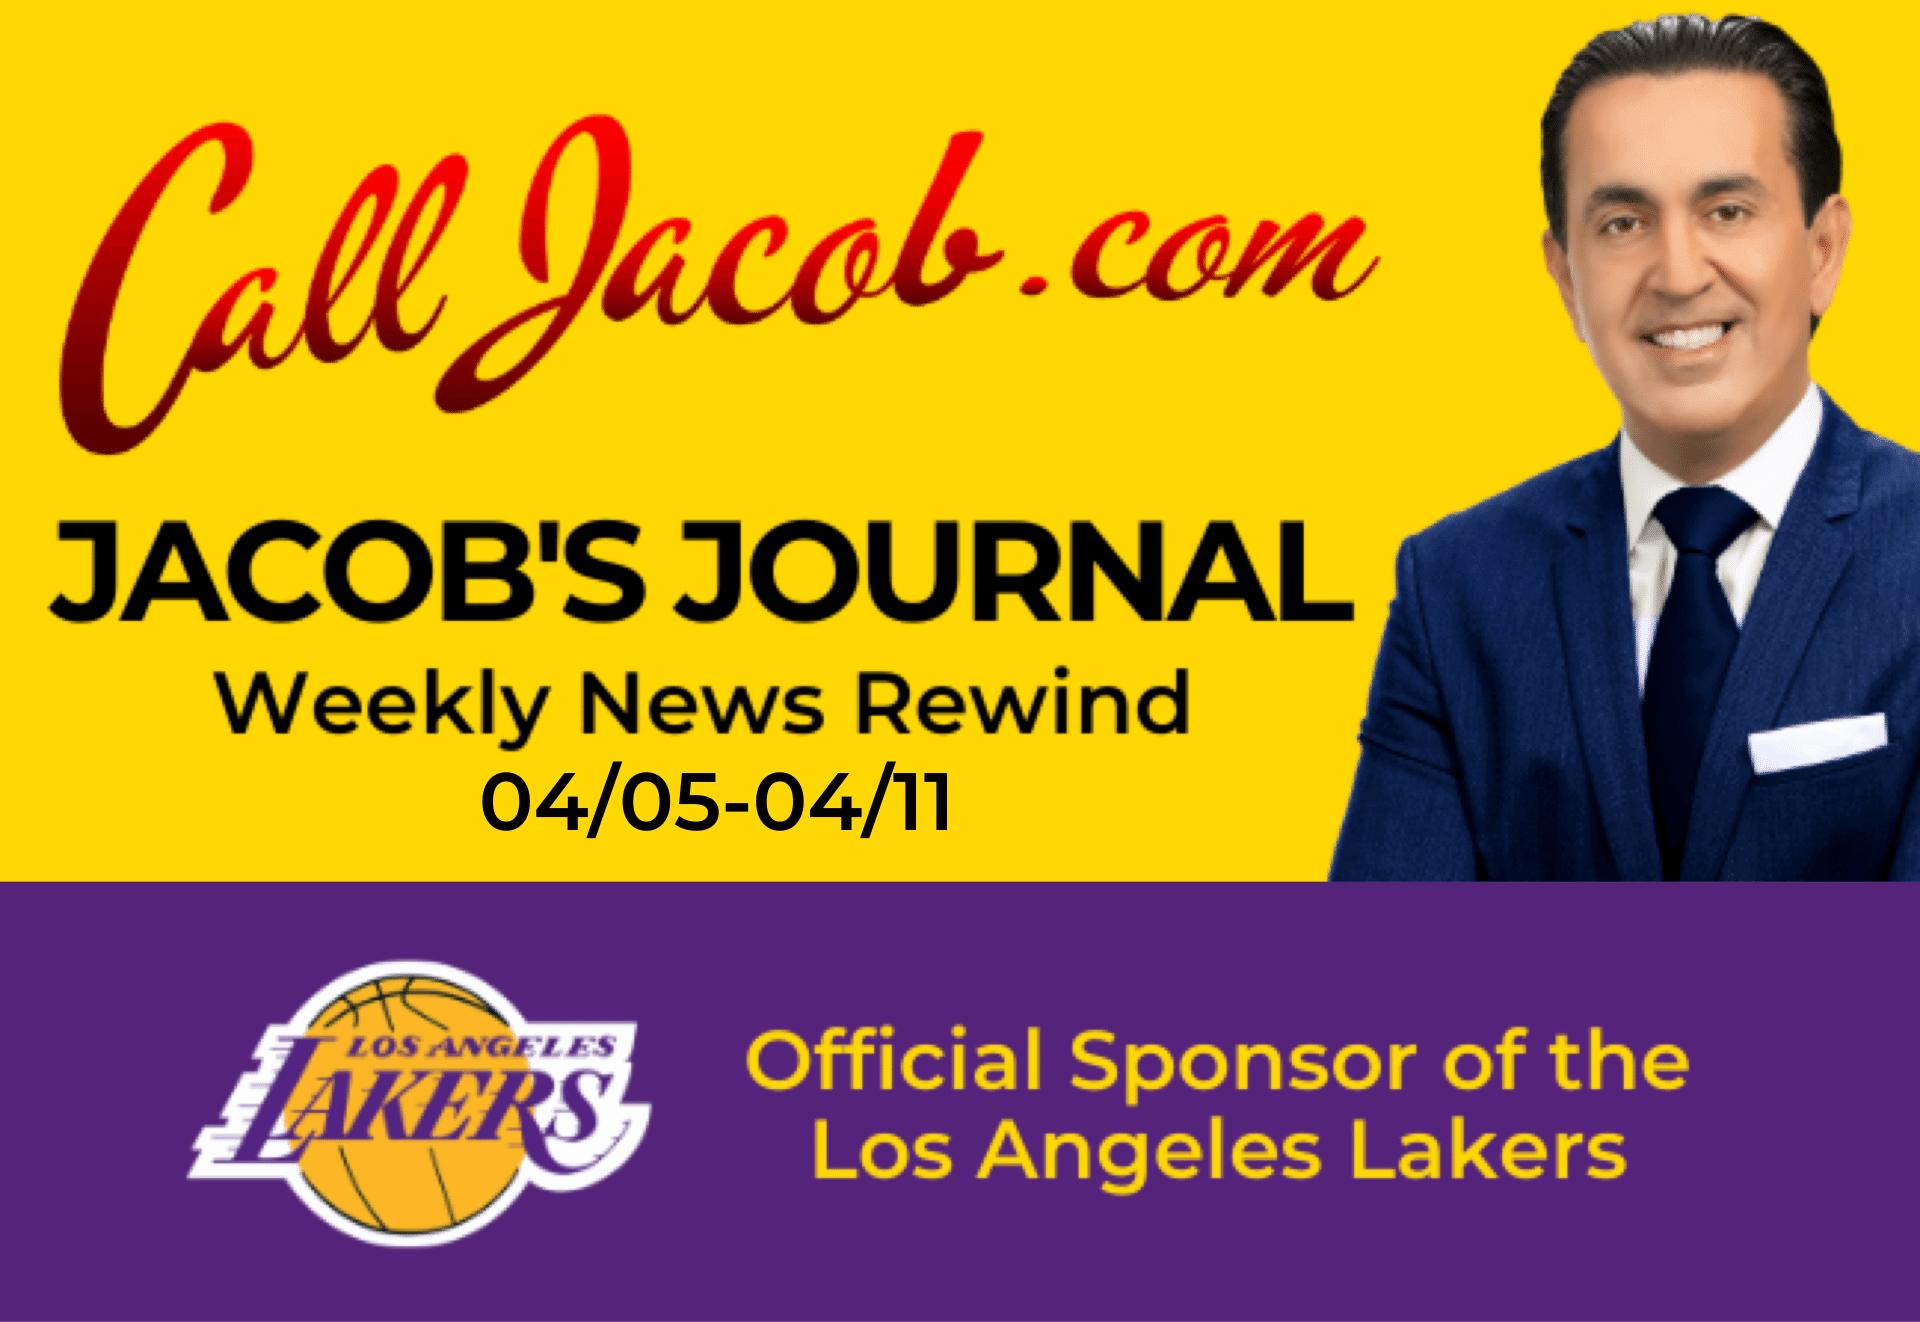 JacobsJournalWeeklyNewsRewind April 5th to April 11th 2021